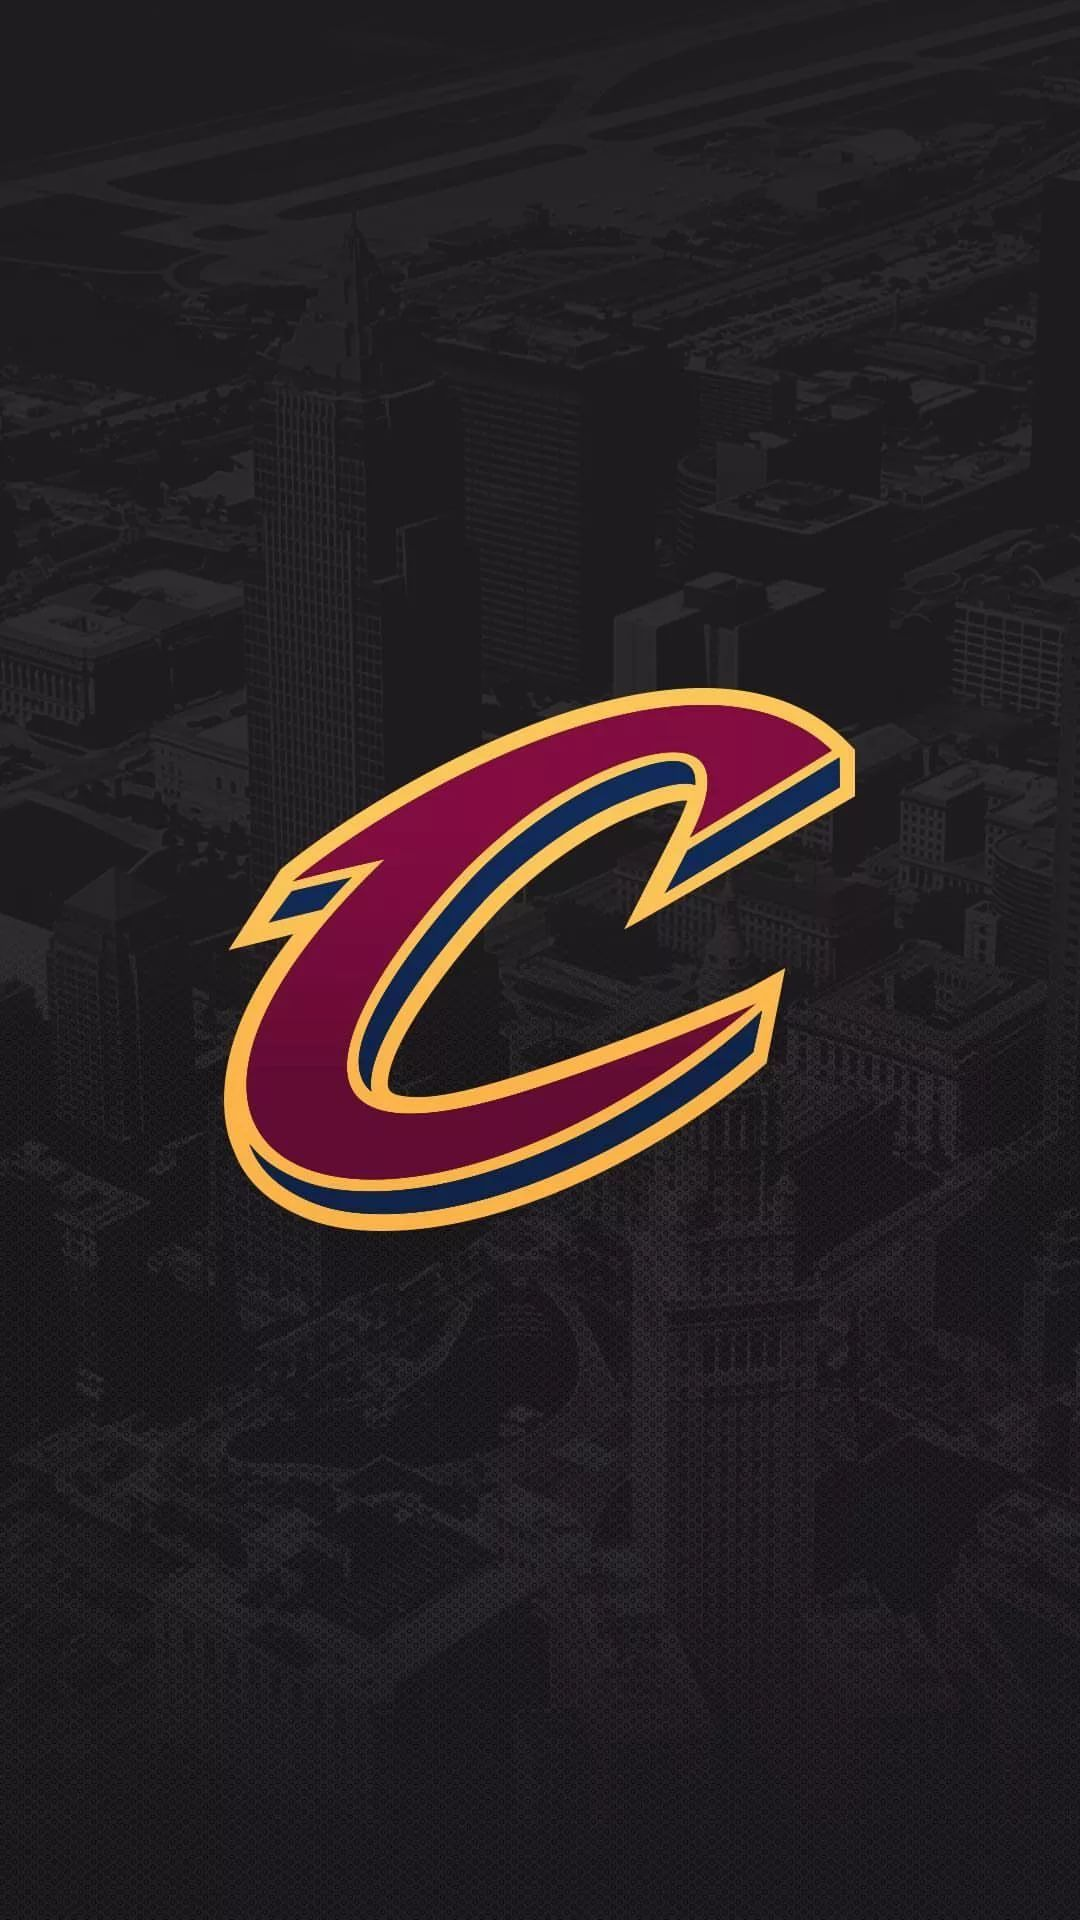 Cleveland hd iPhone 6 wallpaper